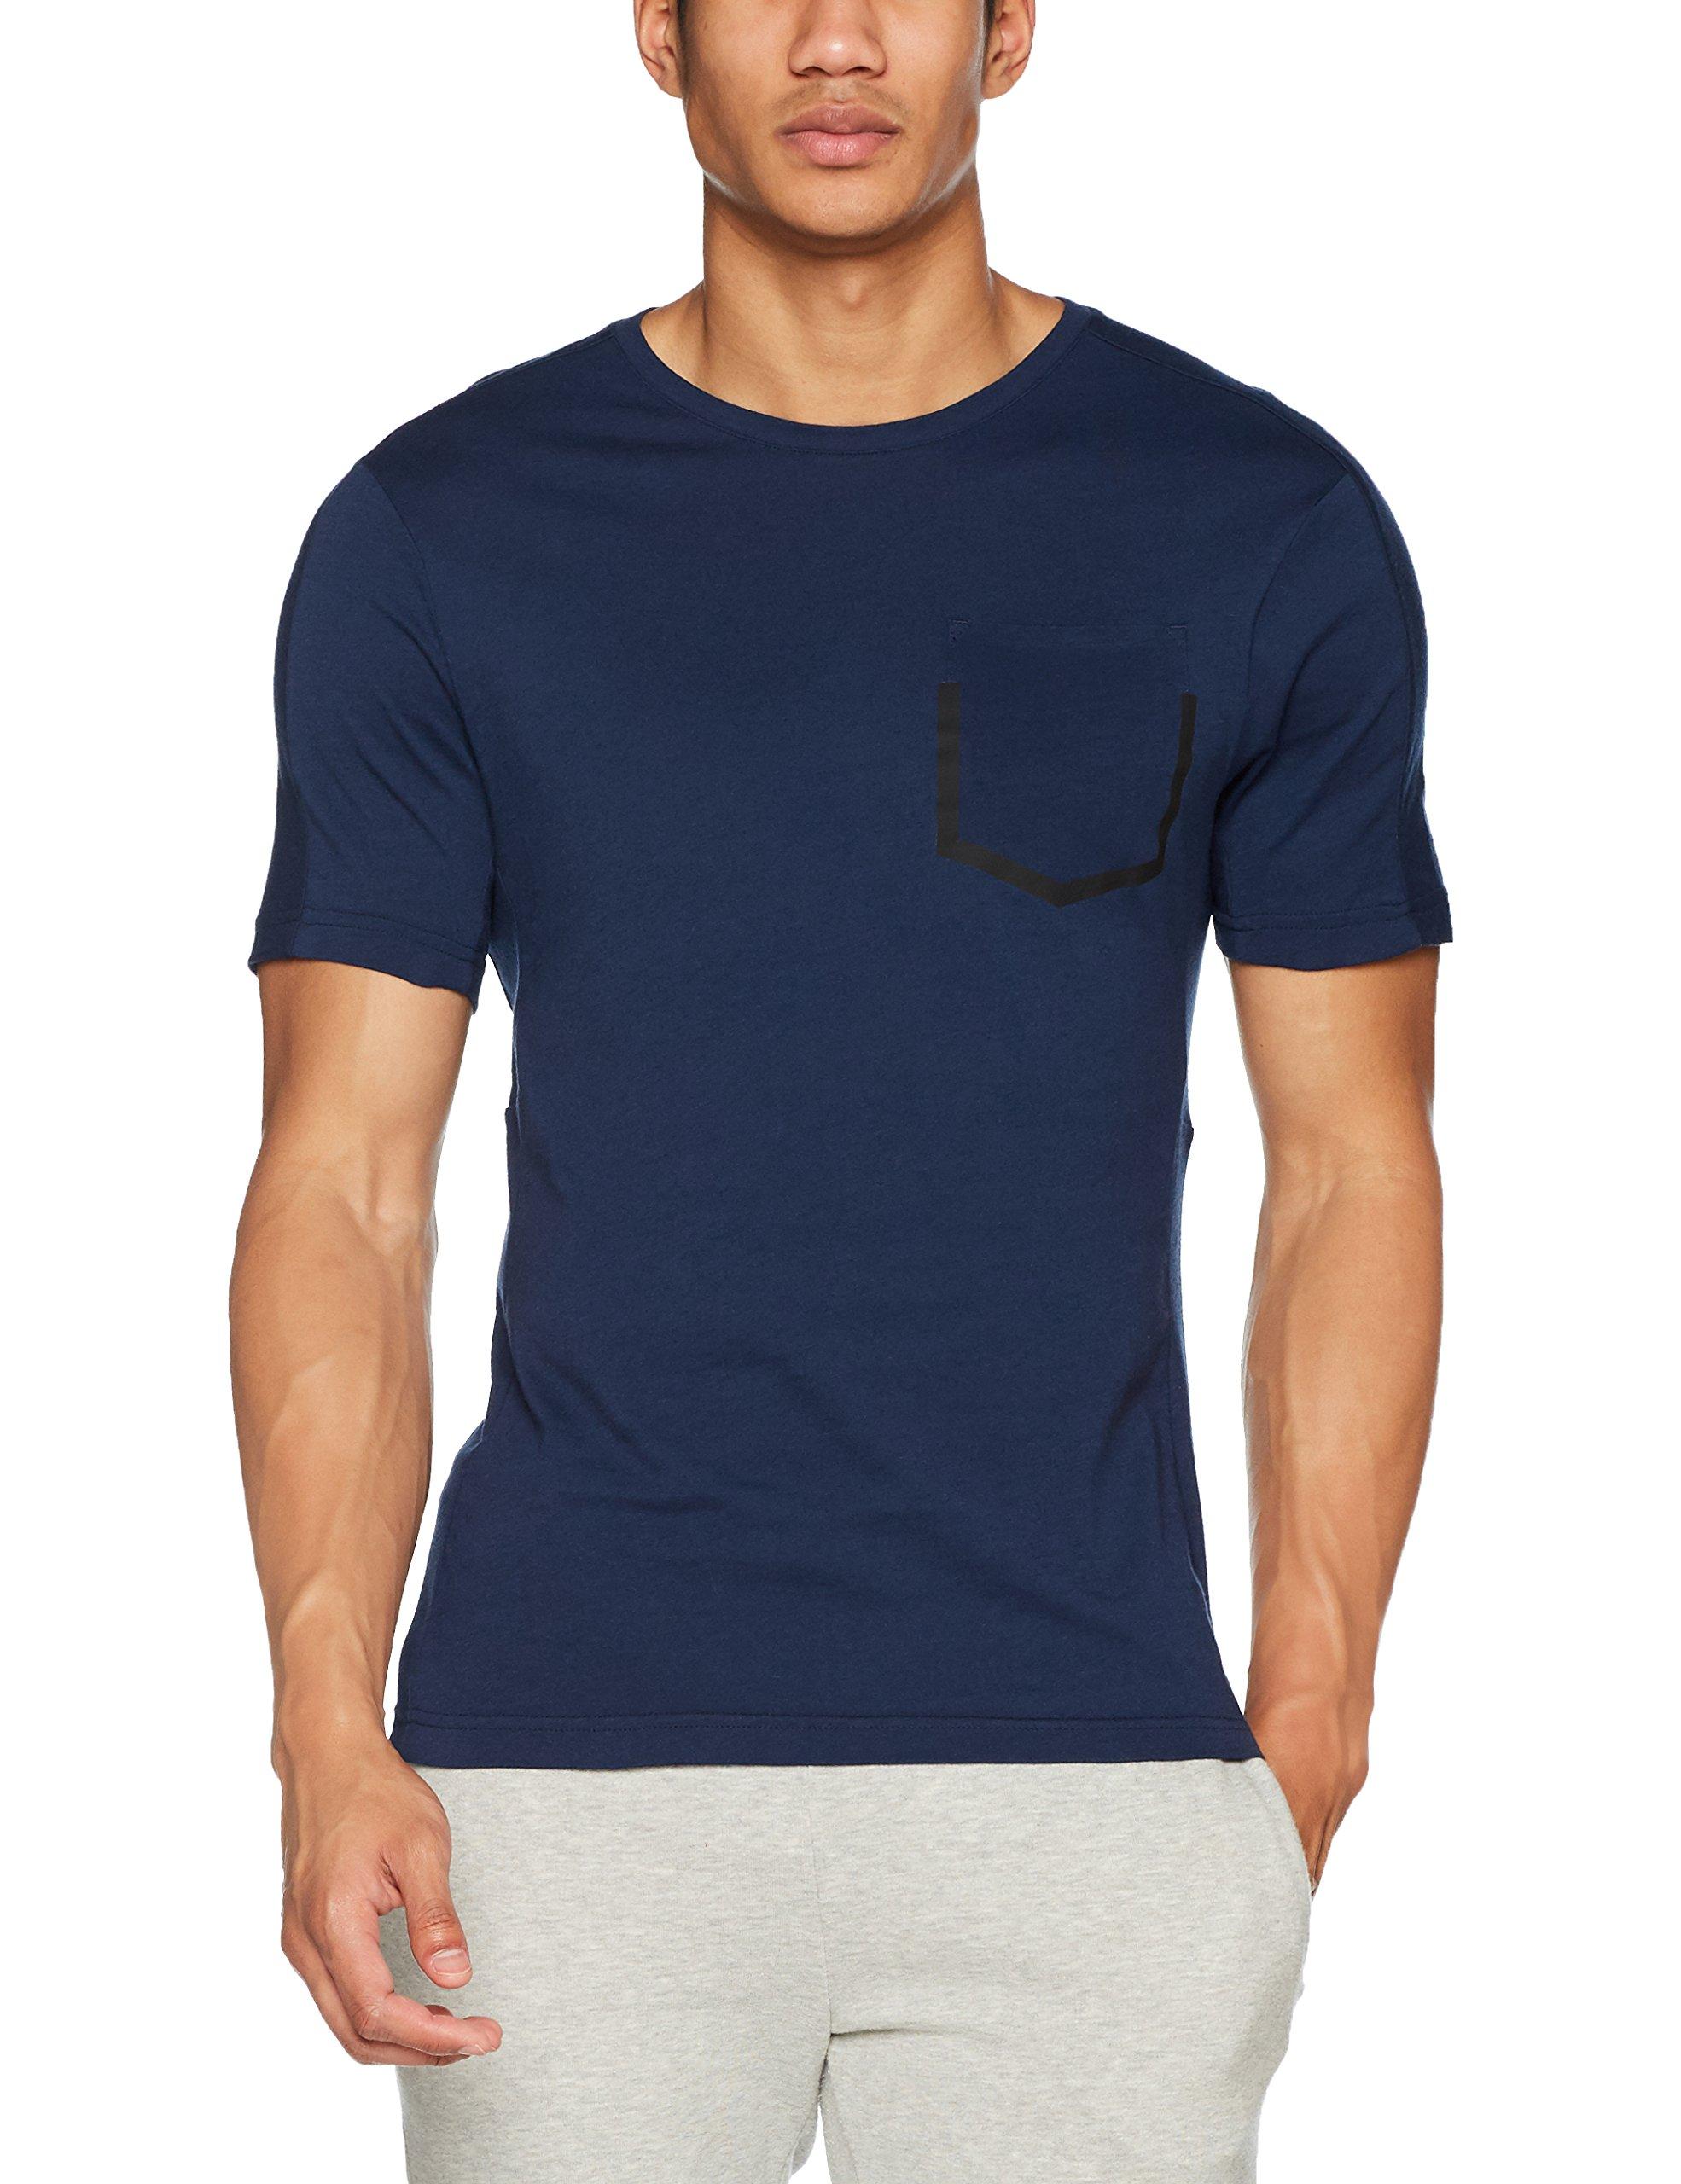 Reebok Herren RCF Polyamid Crew Neck Sweatshirt, Blau (Maruni), L